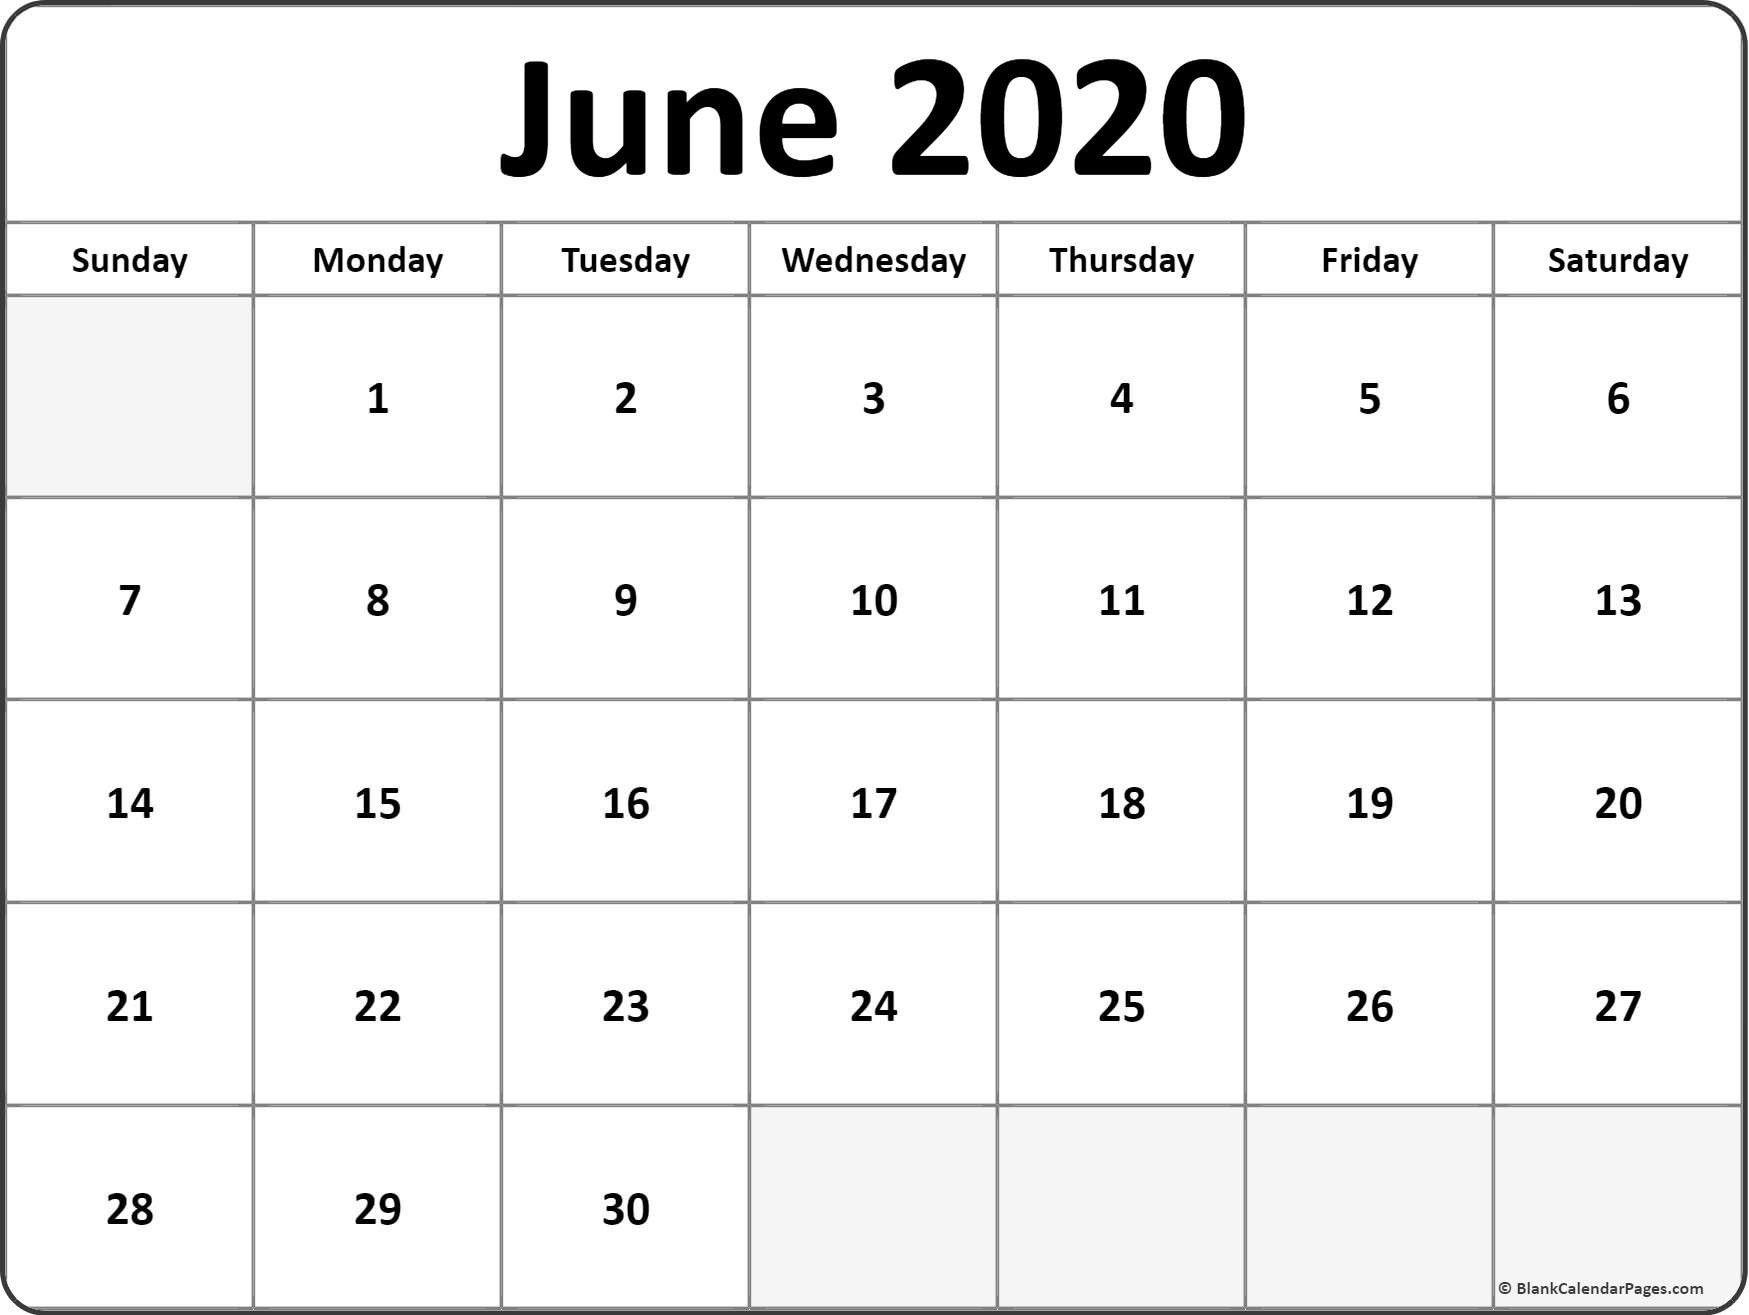 Juner June 2020 Blank Calendar Templates June 2020 Calendar  Blank June Calendar 2020